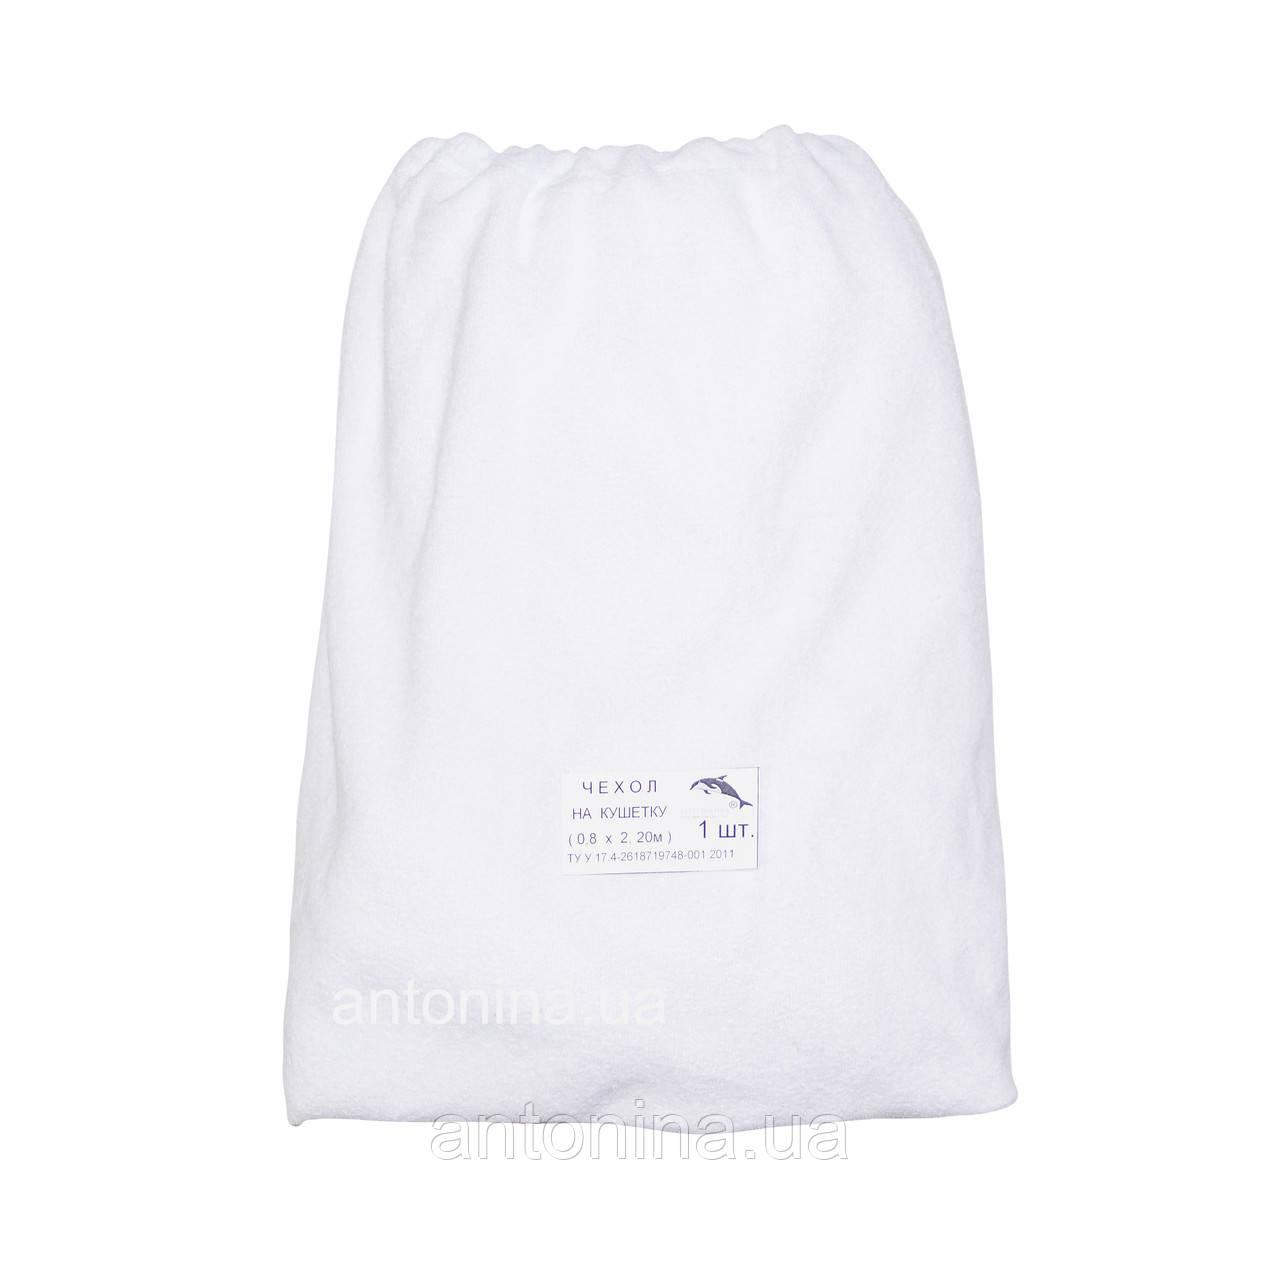 Чехол махровый белый х/б на кушетку 0,8 х 2,2м (с завязками)